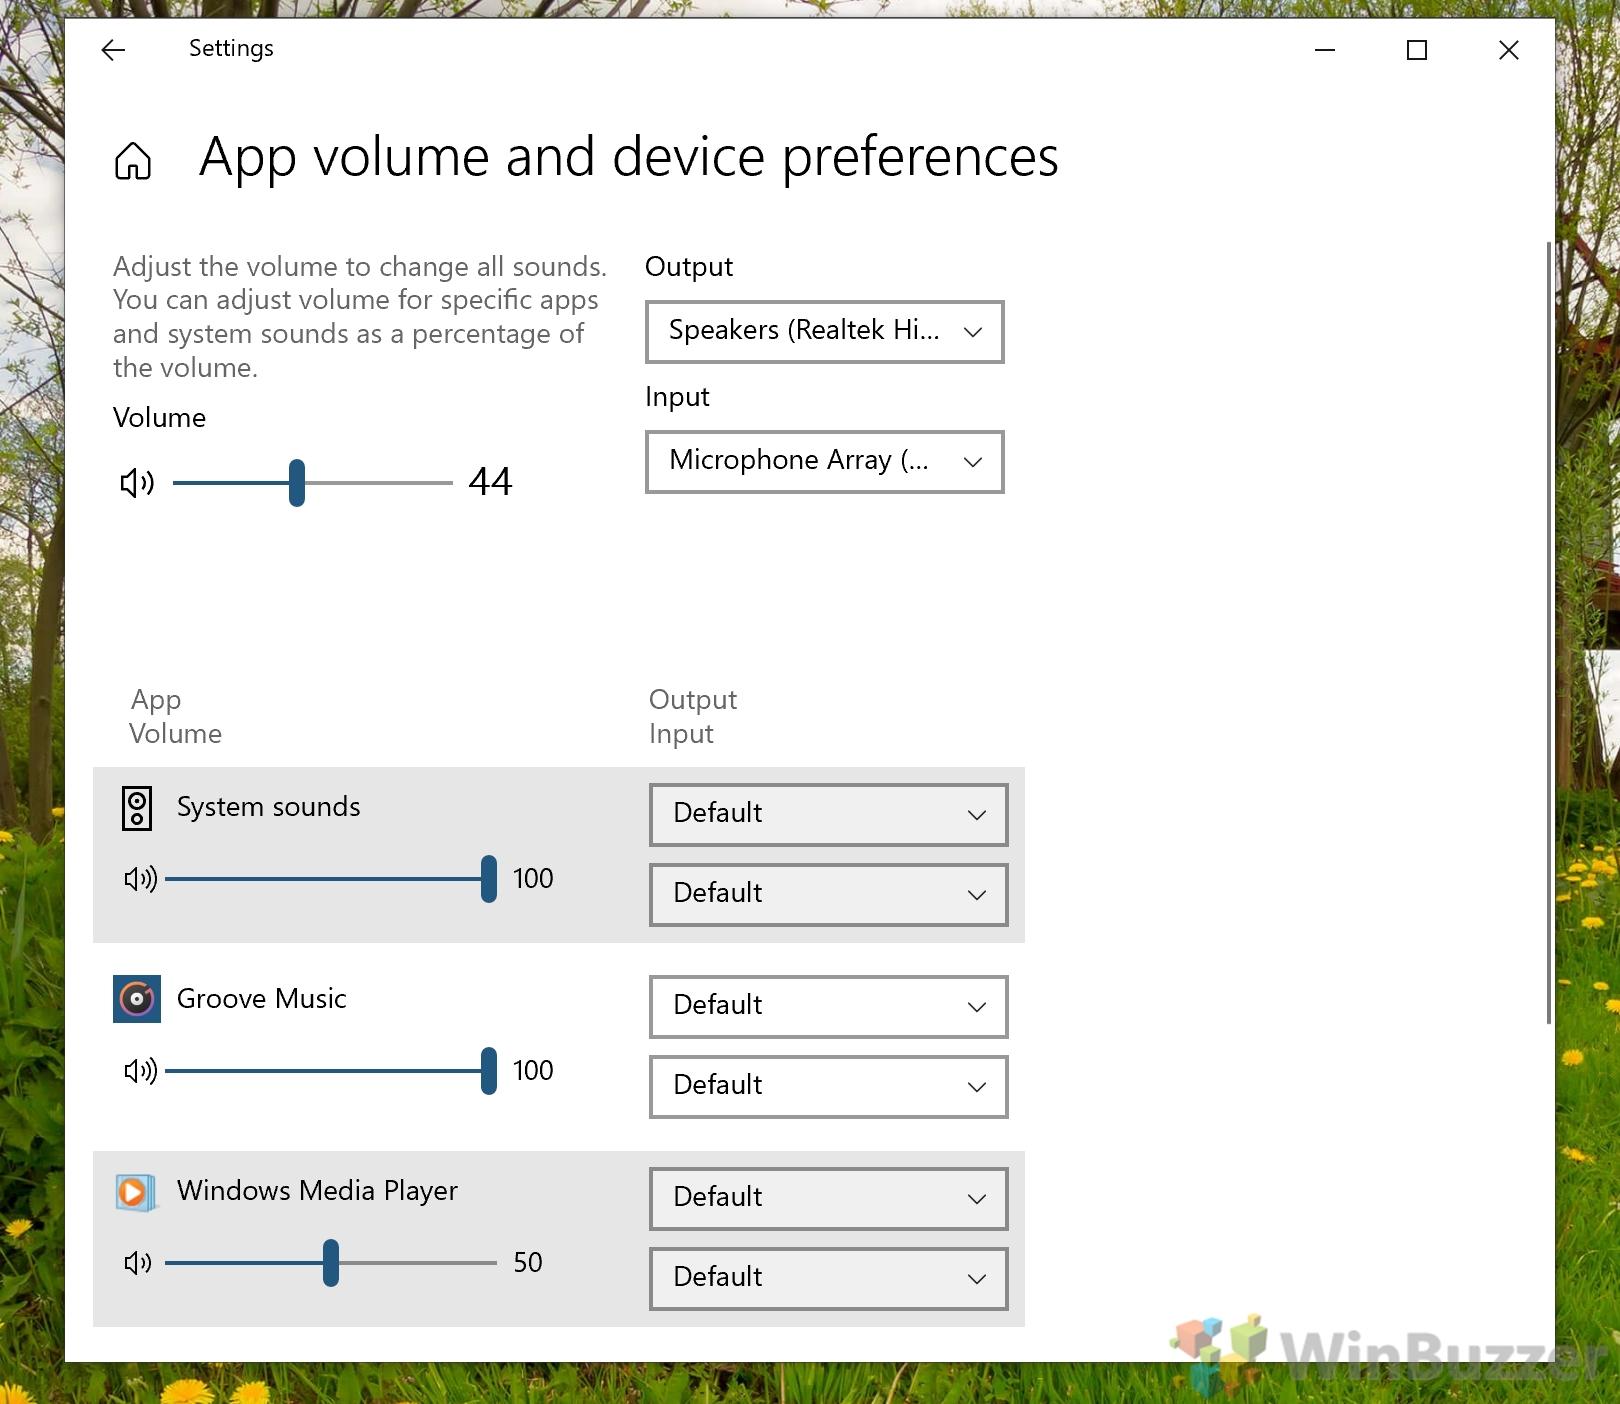 Windows 10 - Settings - System - Sound - Advanced Sound Options - Change Volume Level